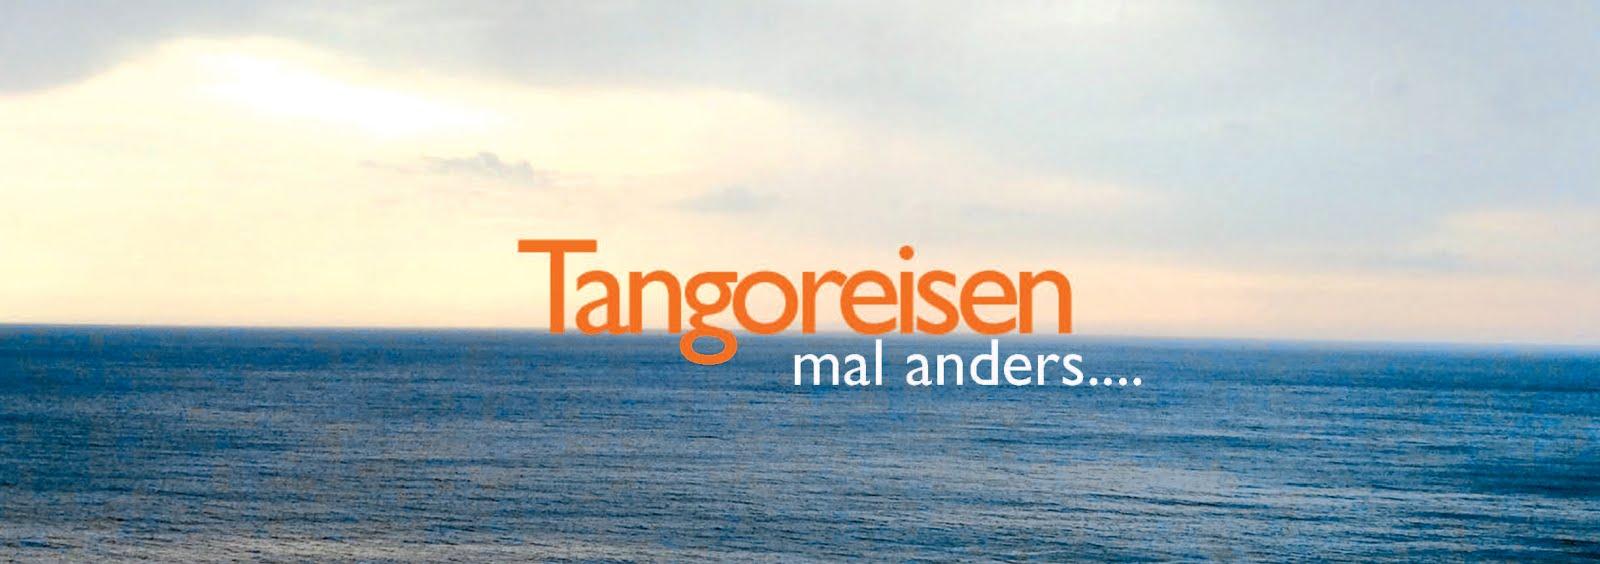 Tangoreisen mal anders